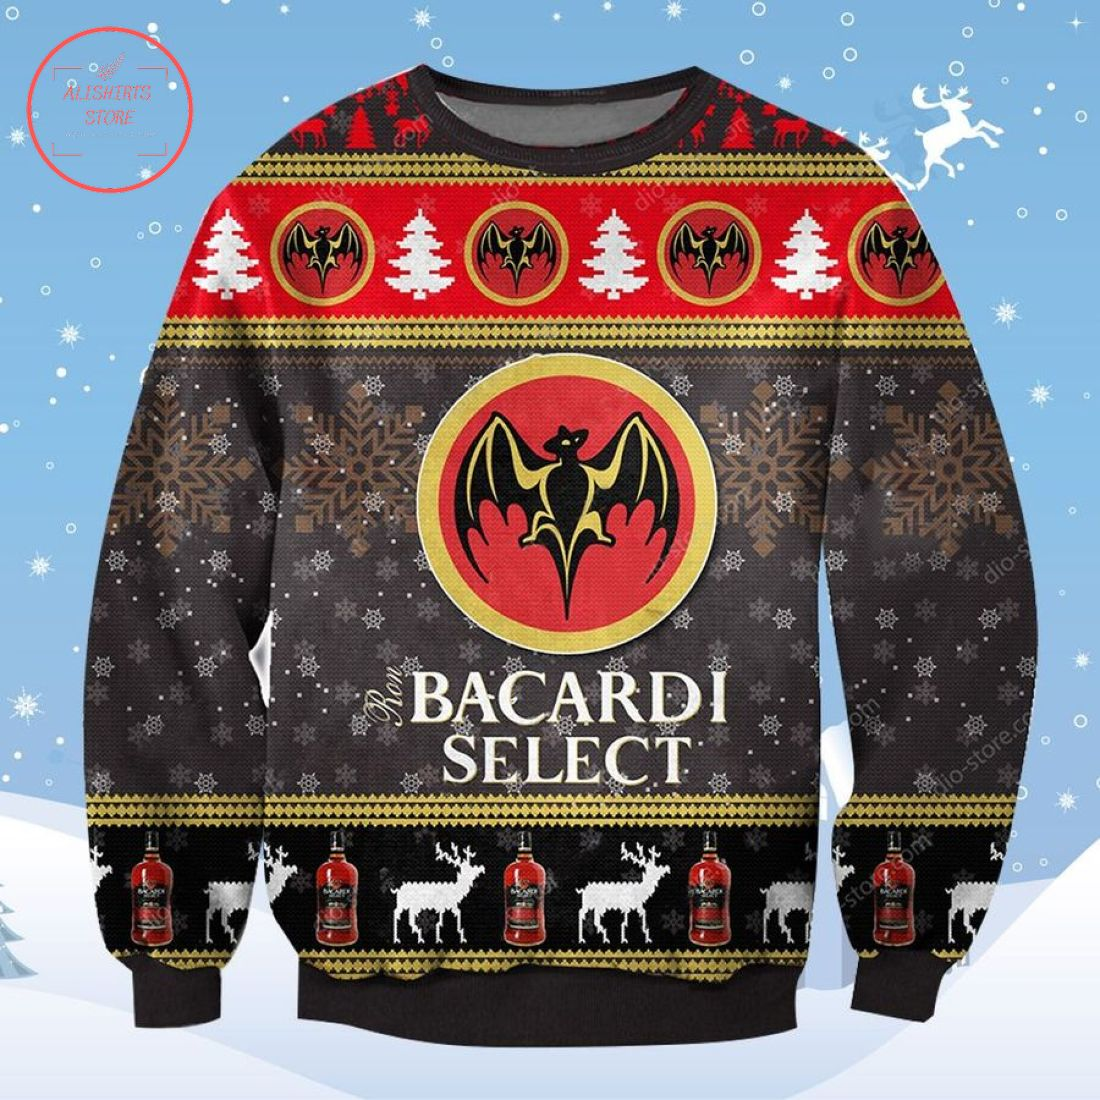 Bacardi Select Ugly Christmas Sweater